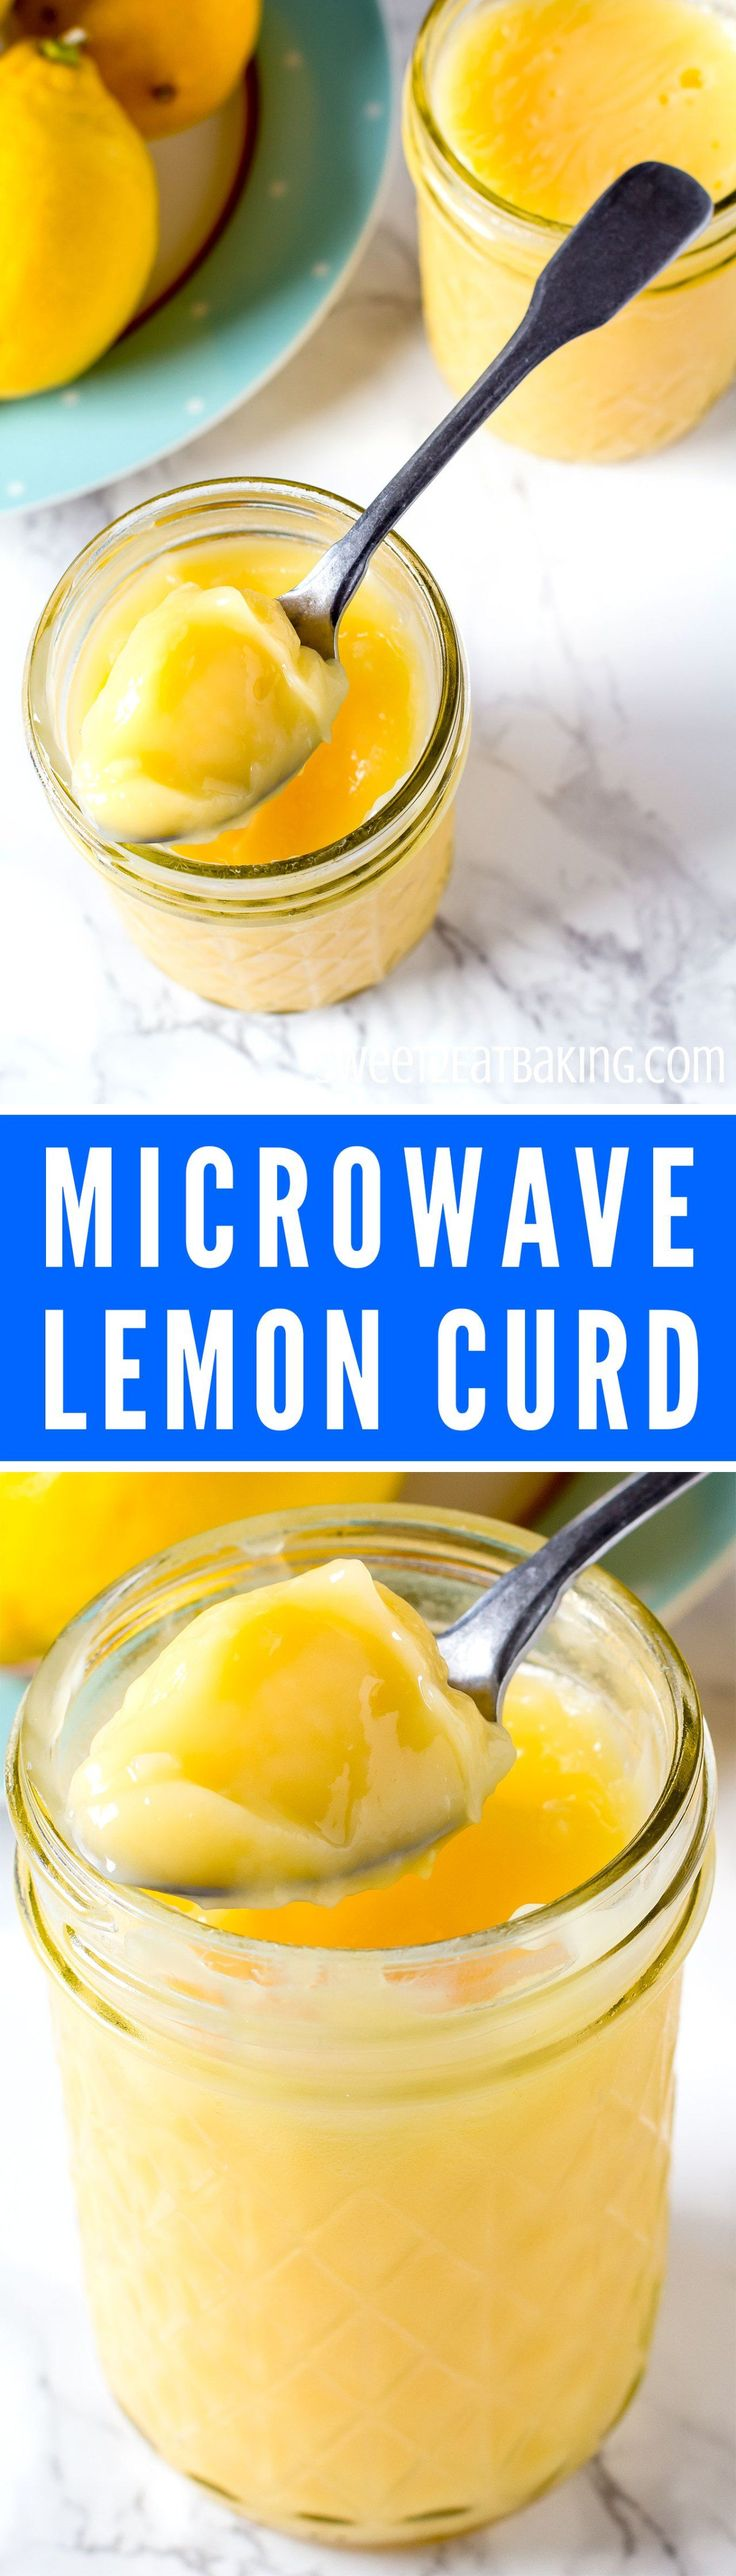 Homemade Microwave Lemon Curd Recipe